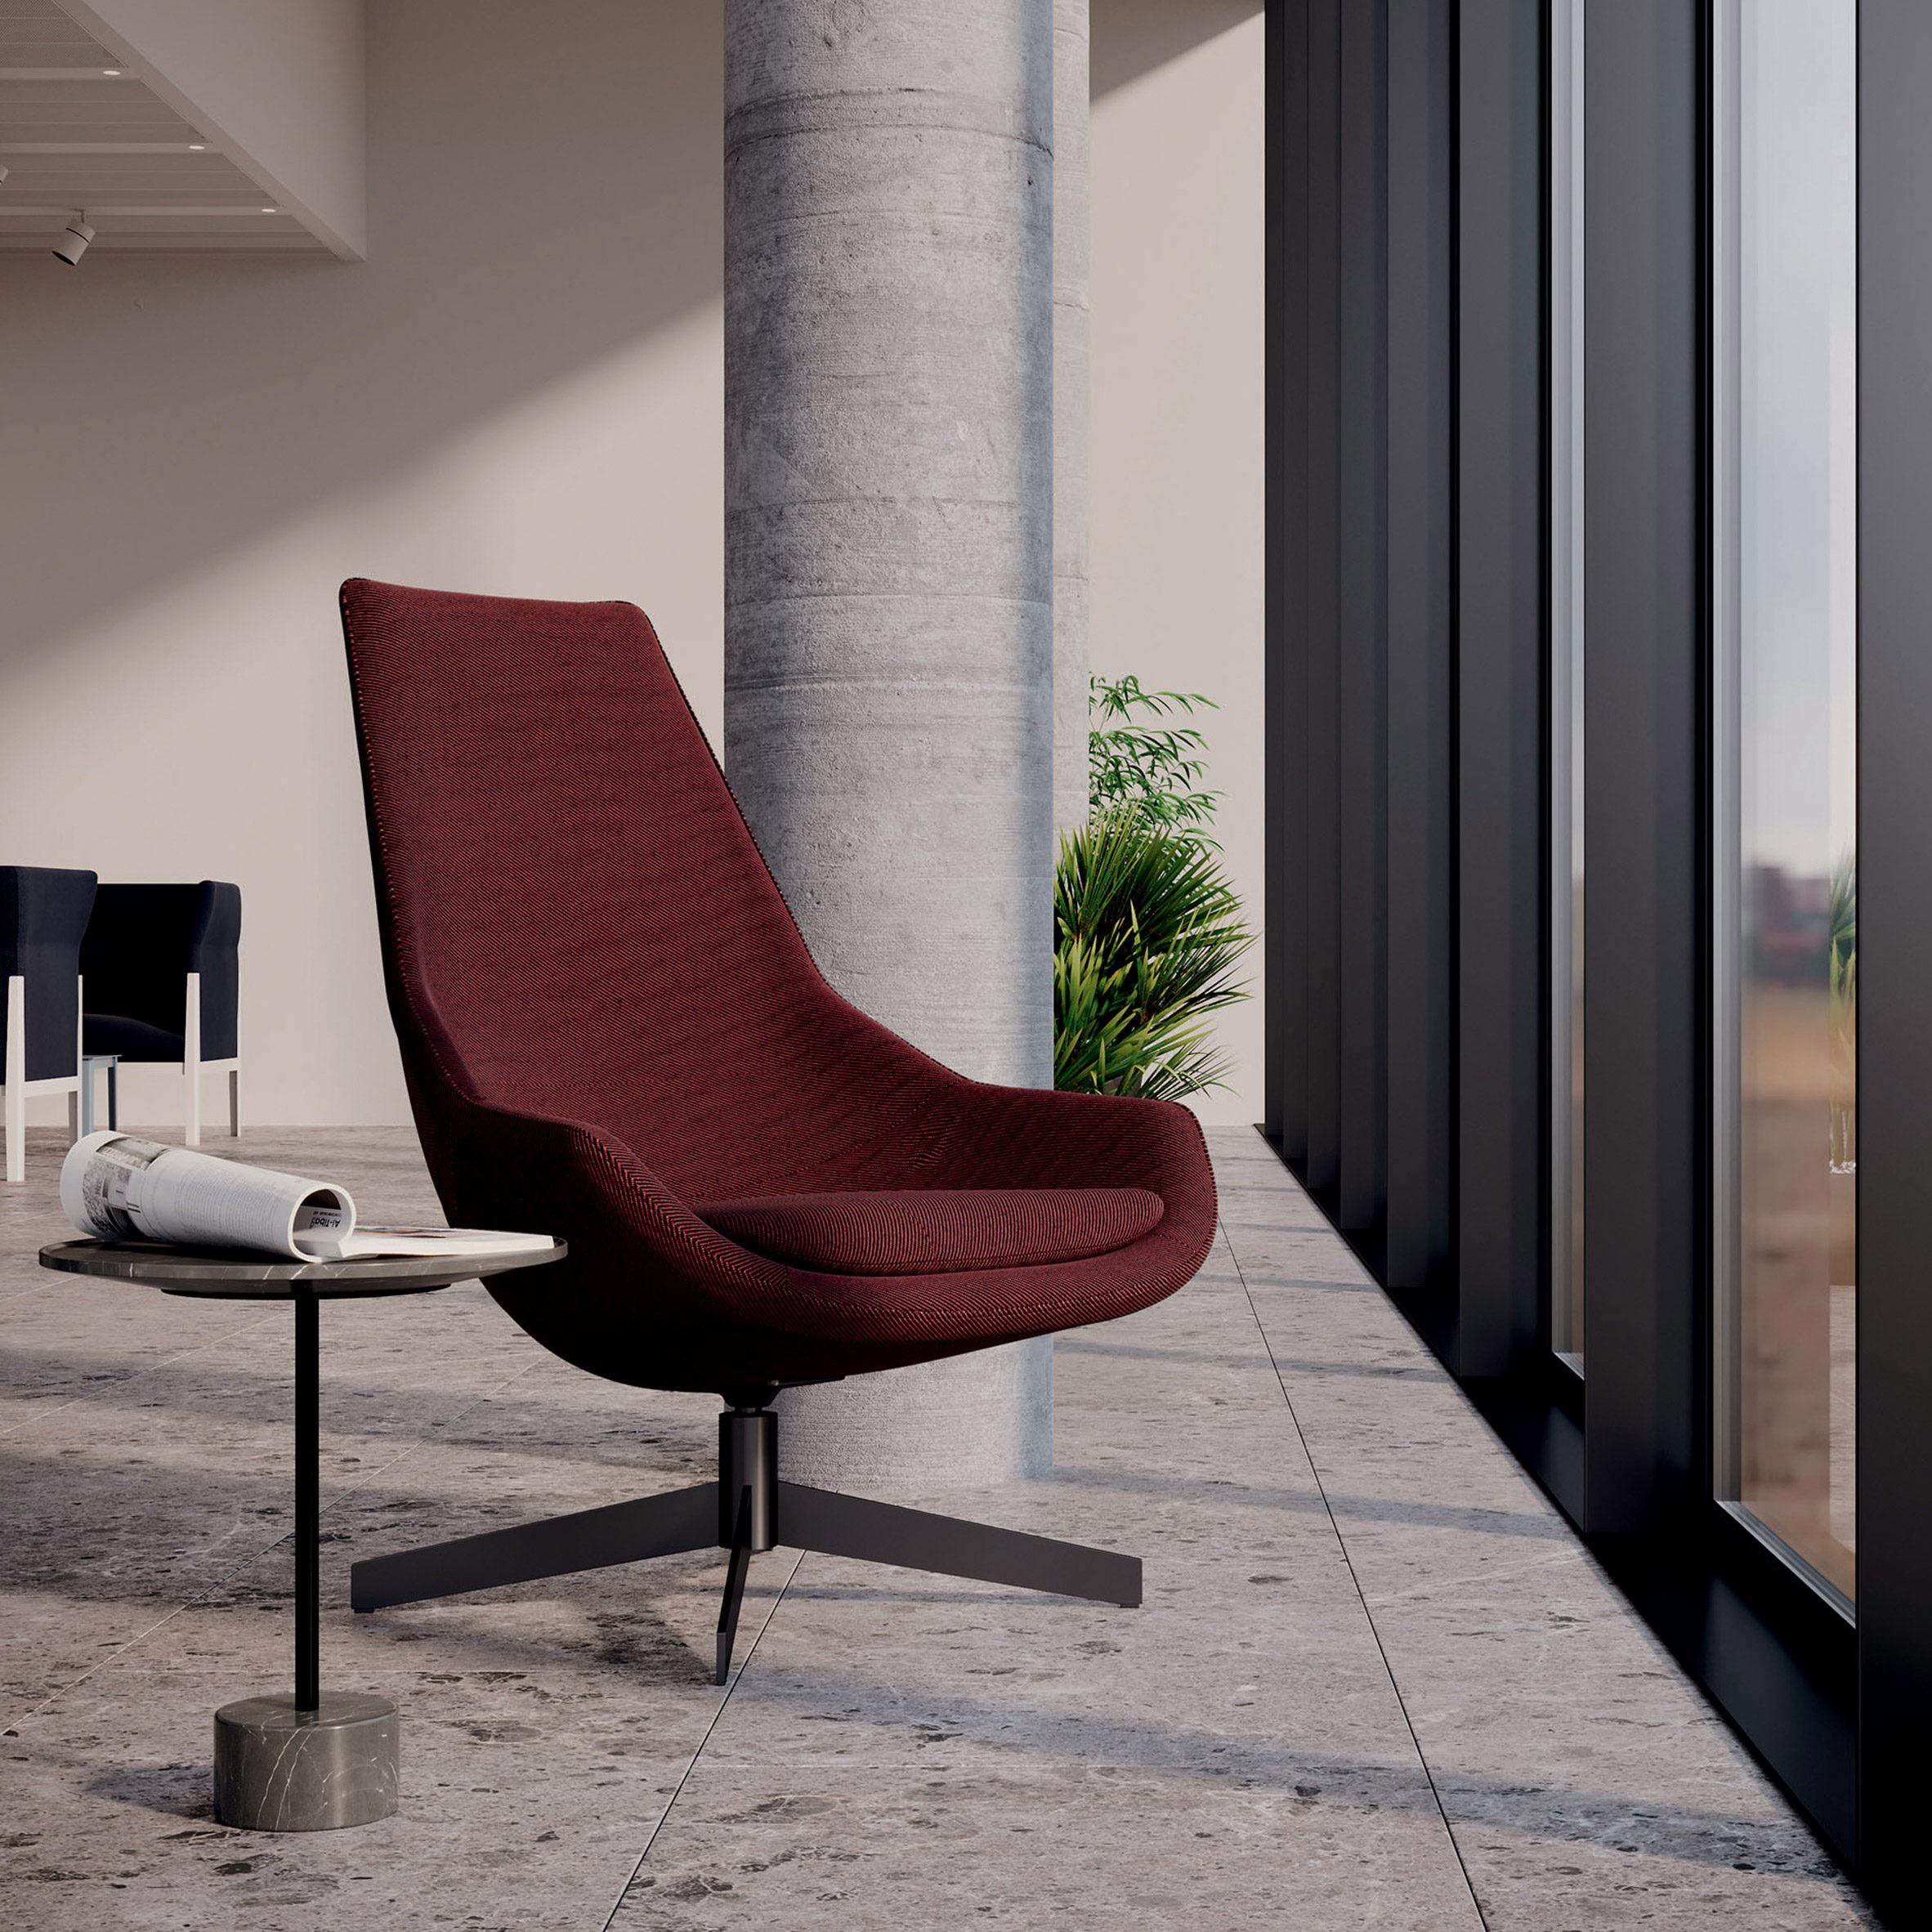 Exord Pro chair by Jeffrey Bernett for Cassina